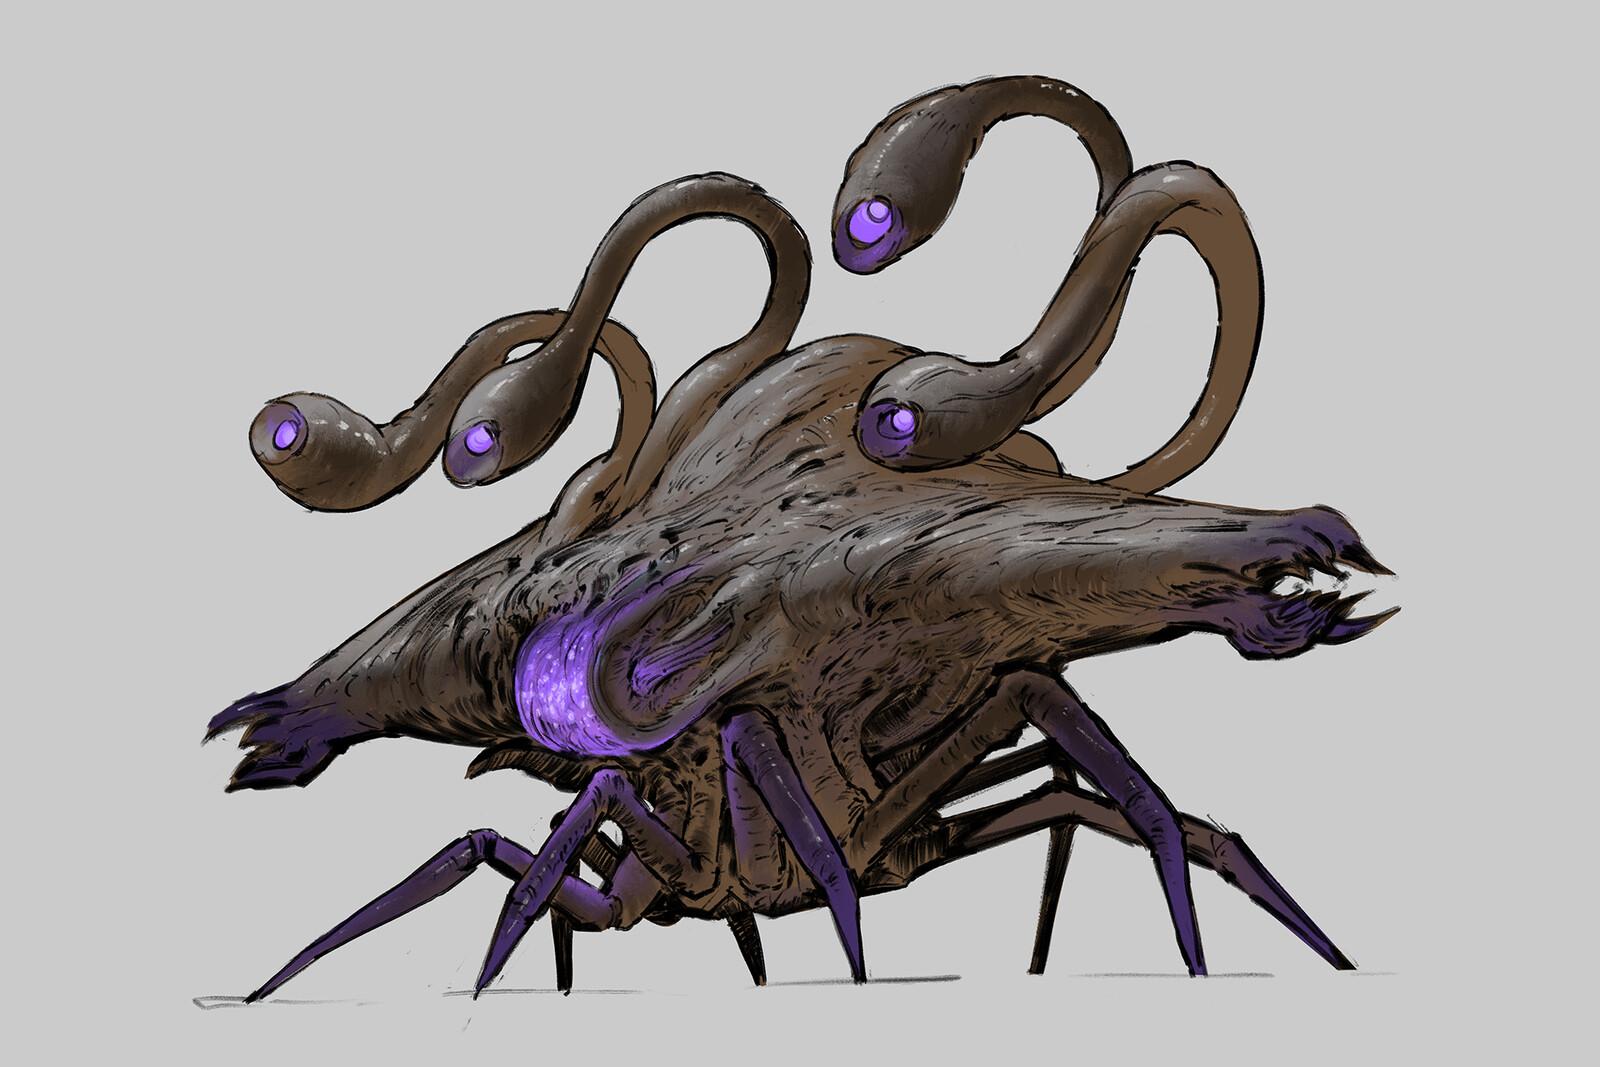 Project Origin - Creatures